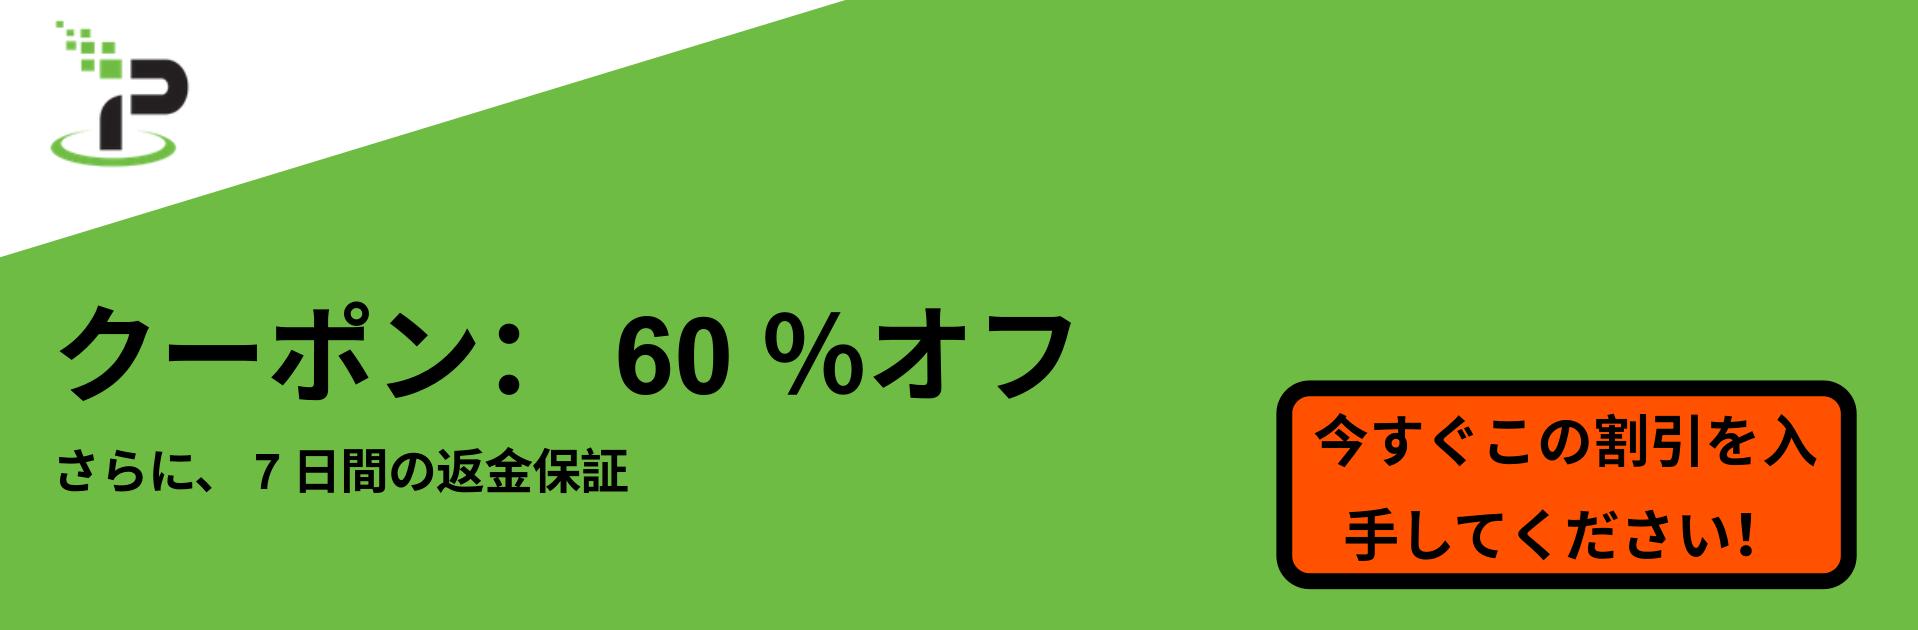 IPVanishクーポンバナー-60%オフ